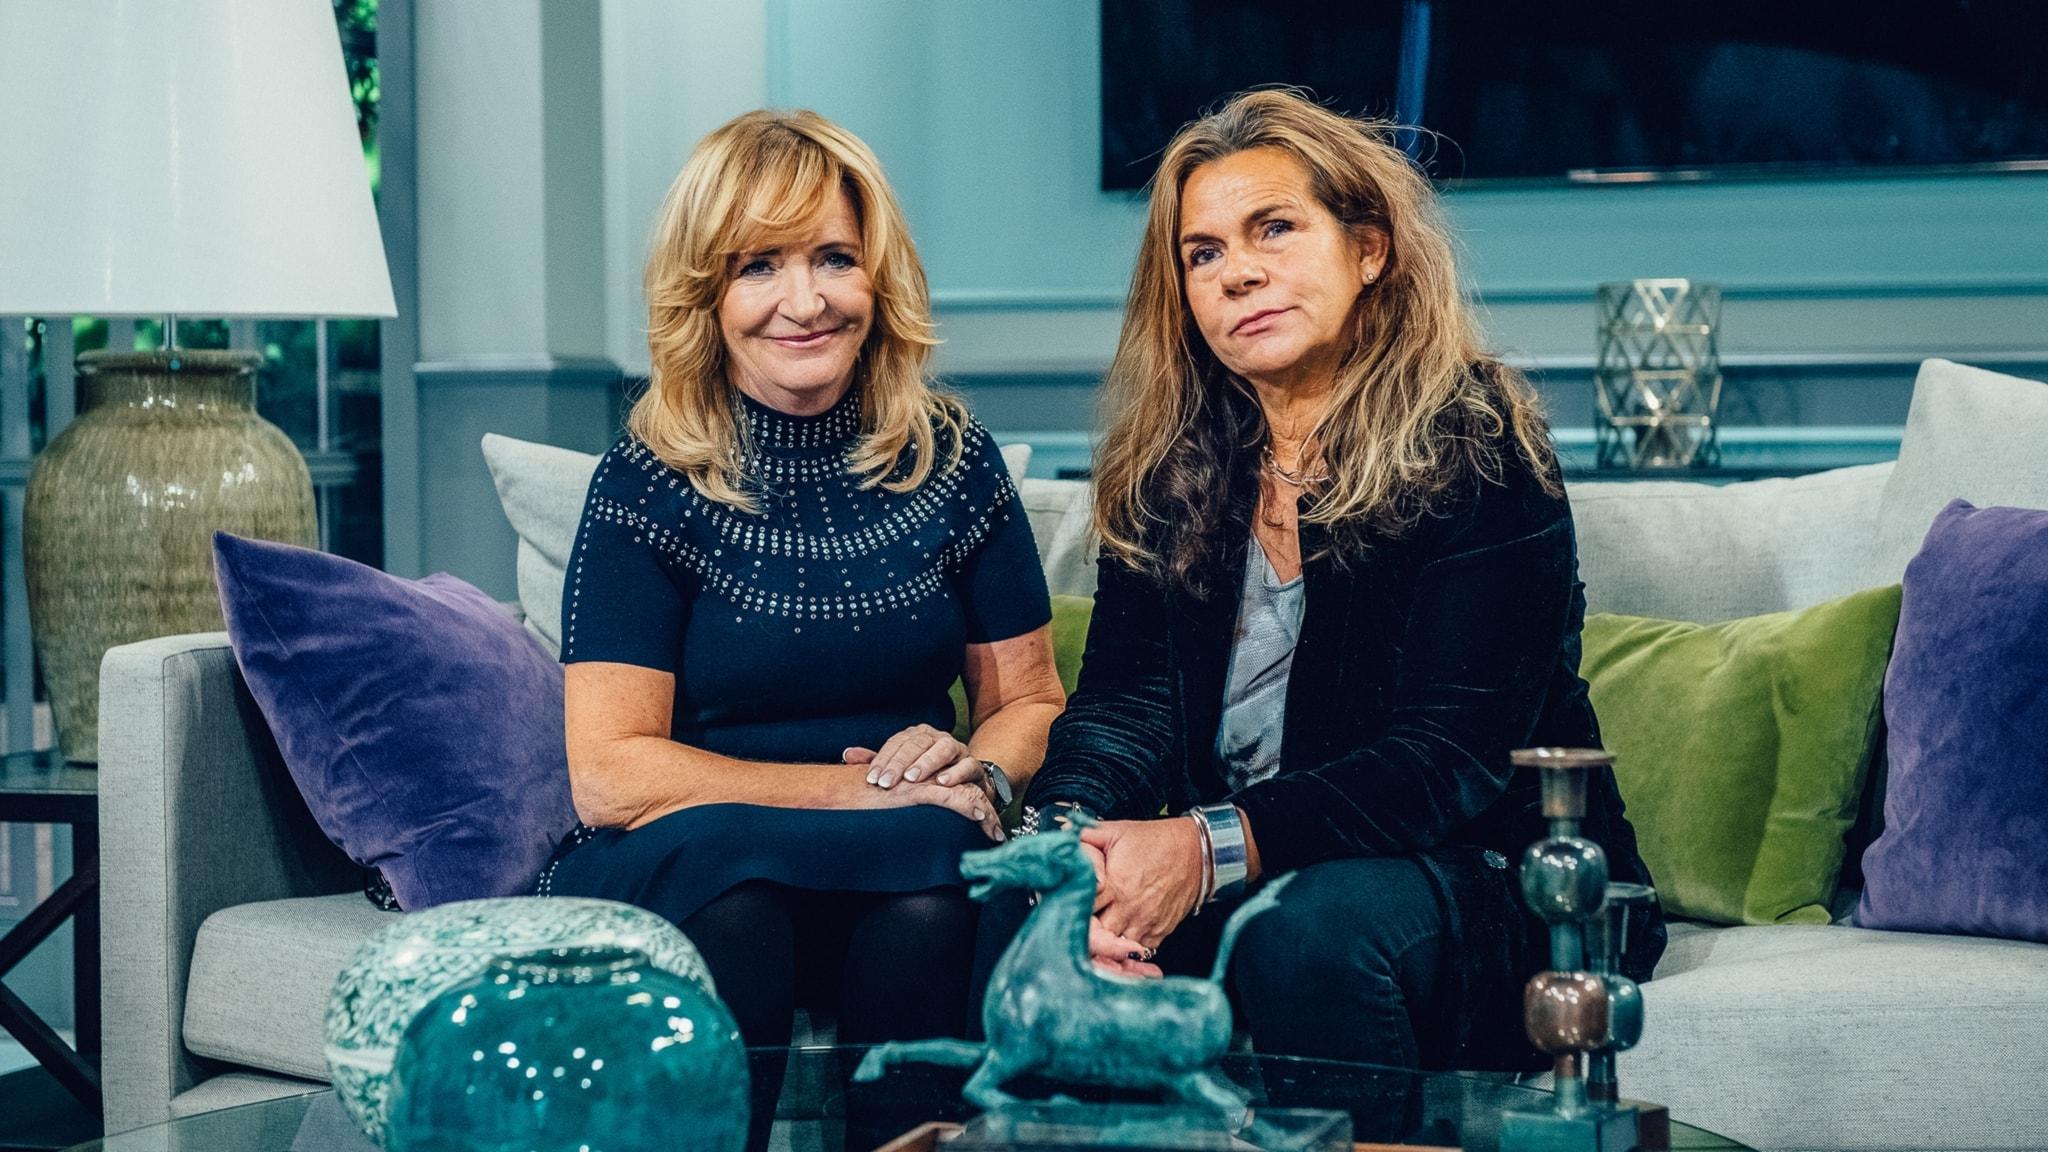 Katarina Hahr möter journalisten Malou von Sivers i ett samtal om föräldraskap